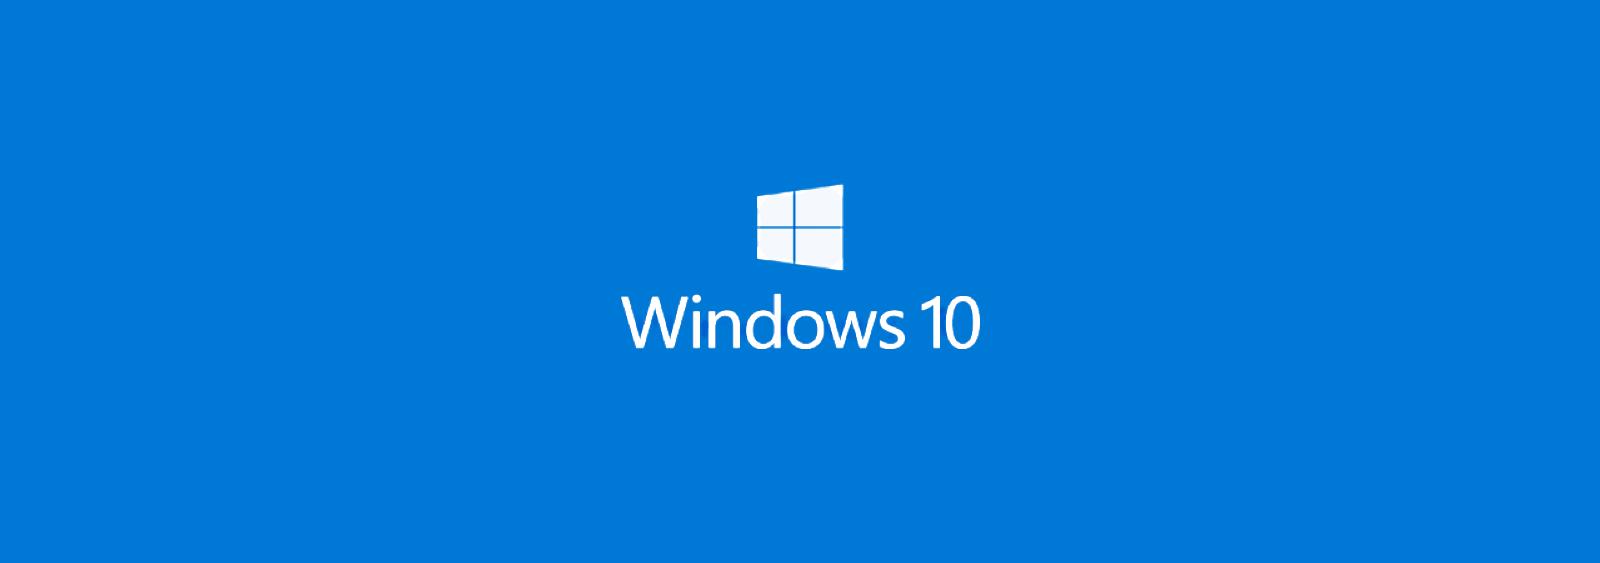 Windows 10 KB4566116 update fixes crashing settings, unlock bug - RapidAPI